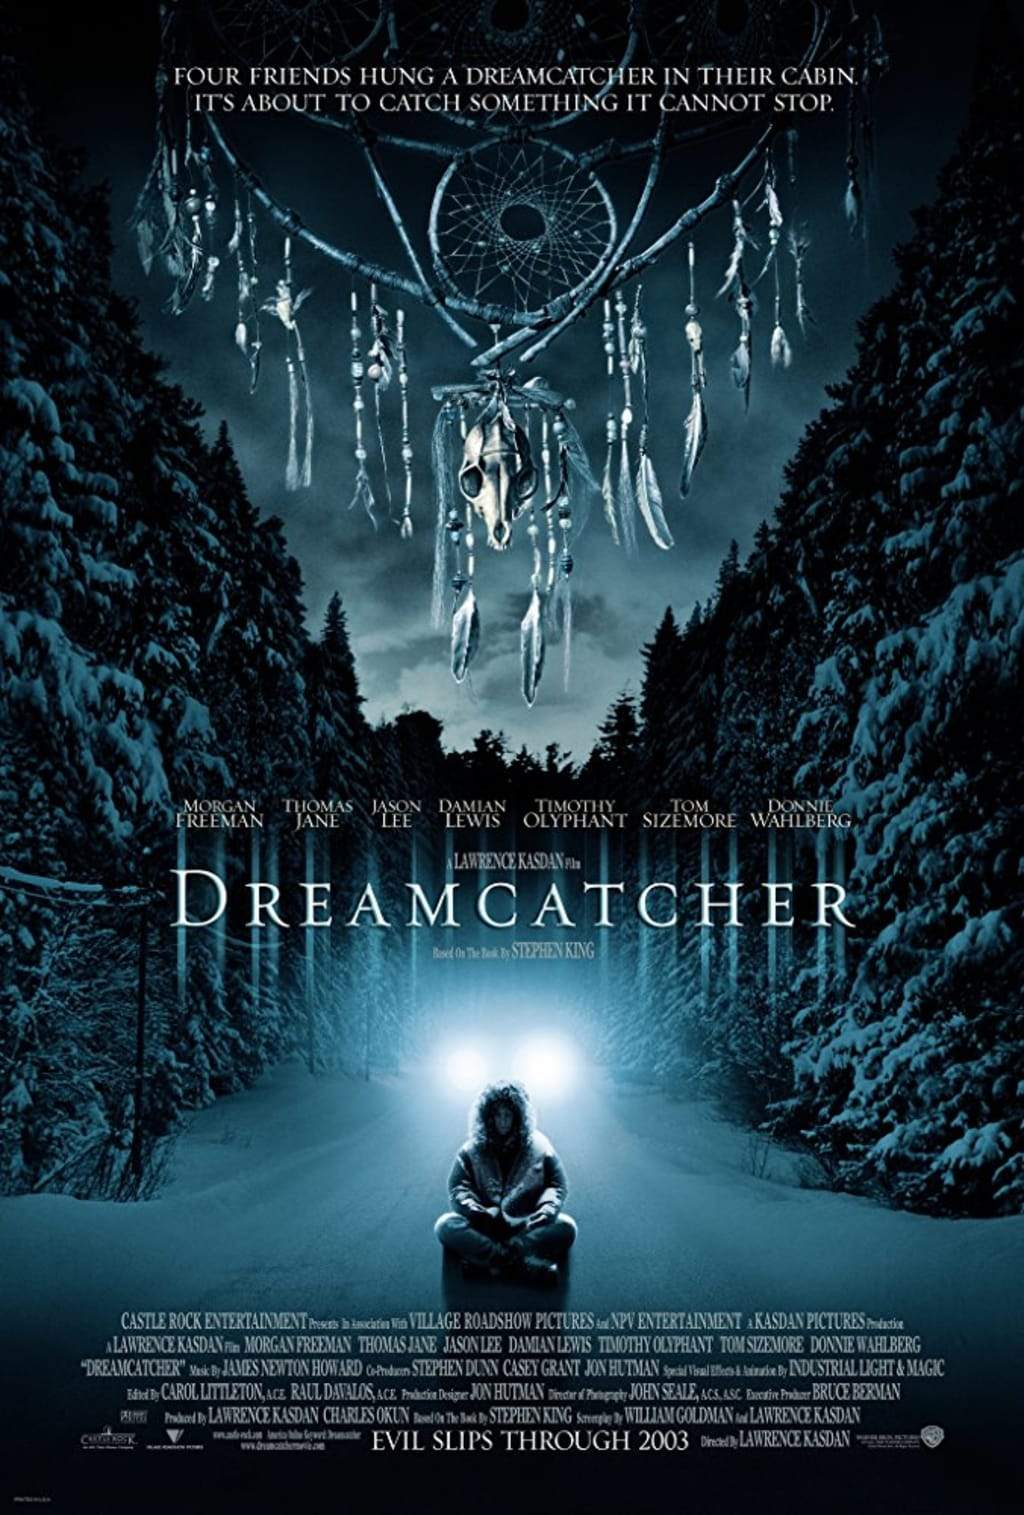 Reed Alexander's Horror Review of 'Dreamcatcher' (2003)